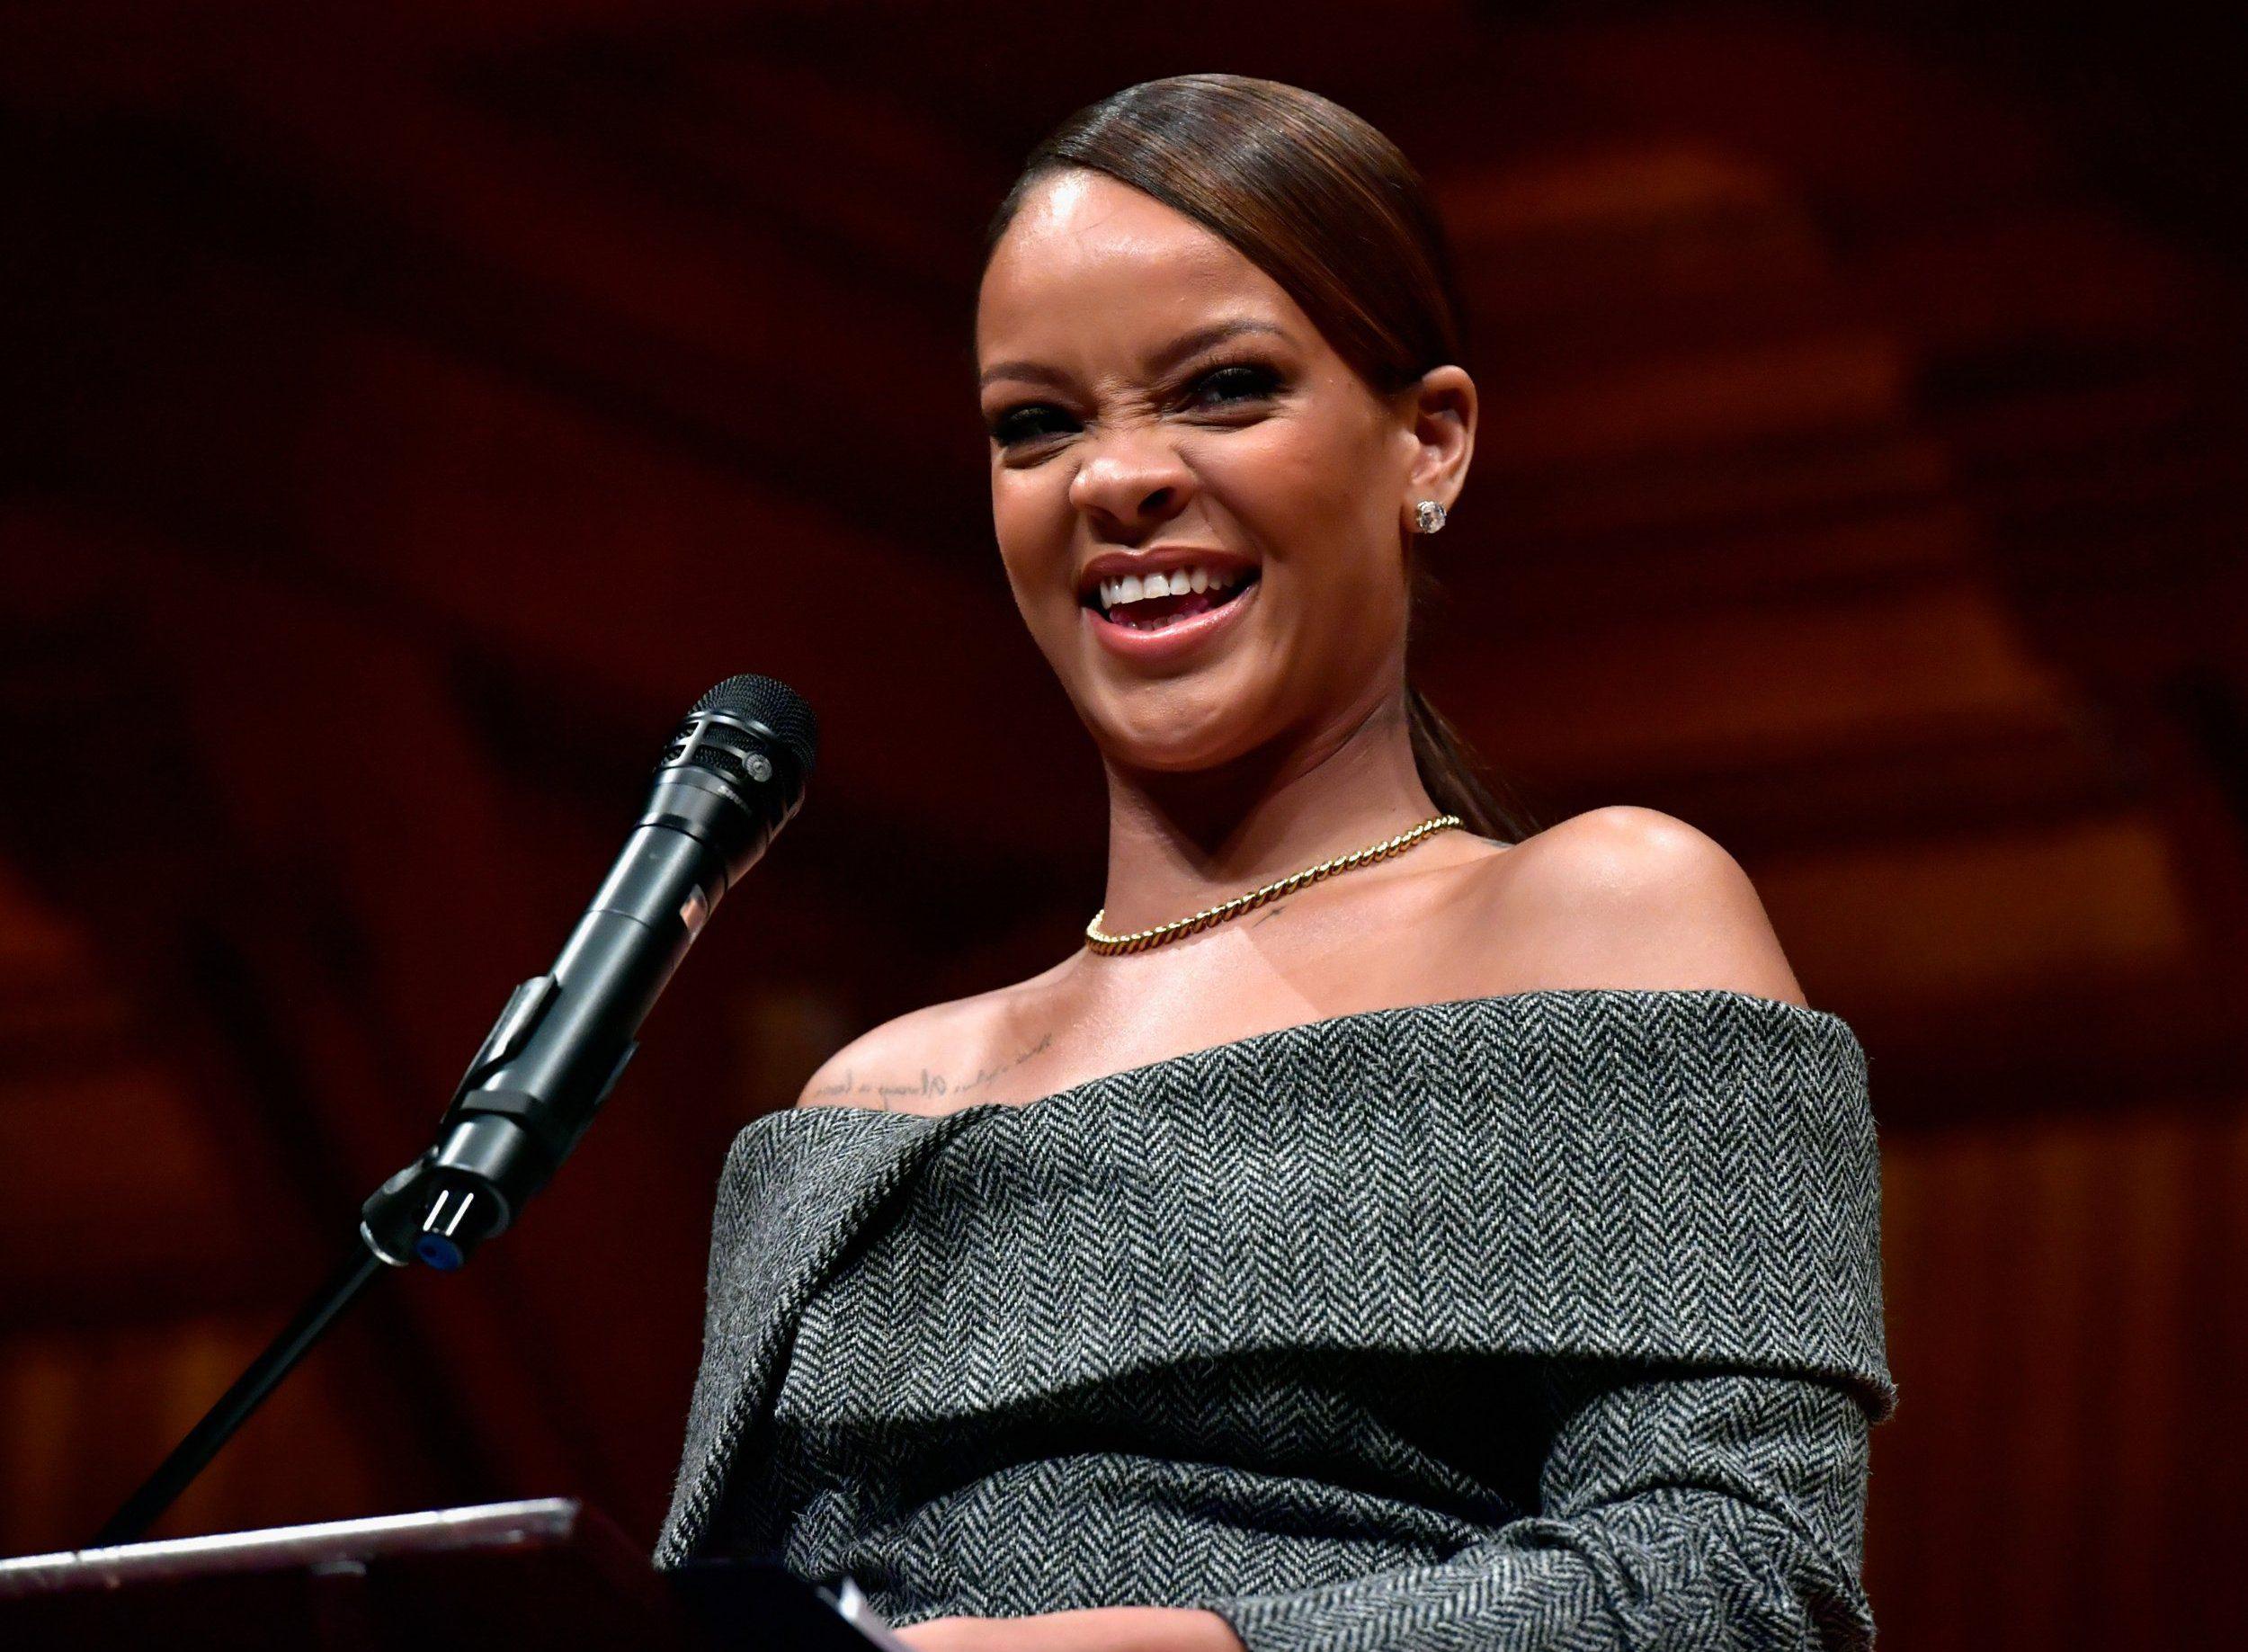 CAMBRIDGE, MA - FEBRUARY 28: Rihanna receives the 2017 Harvard University Humanitarian of the Year Award at Harvard University's Sanders Theatre on February 28, 2017 in Cambridge, Massachusetts. (Photo by Paul Marotta/Getty Images)